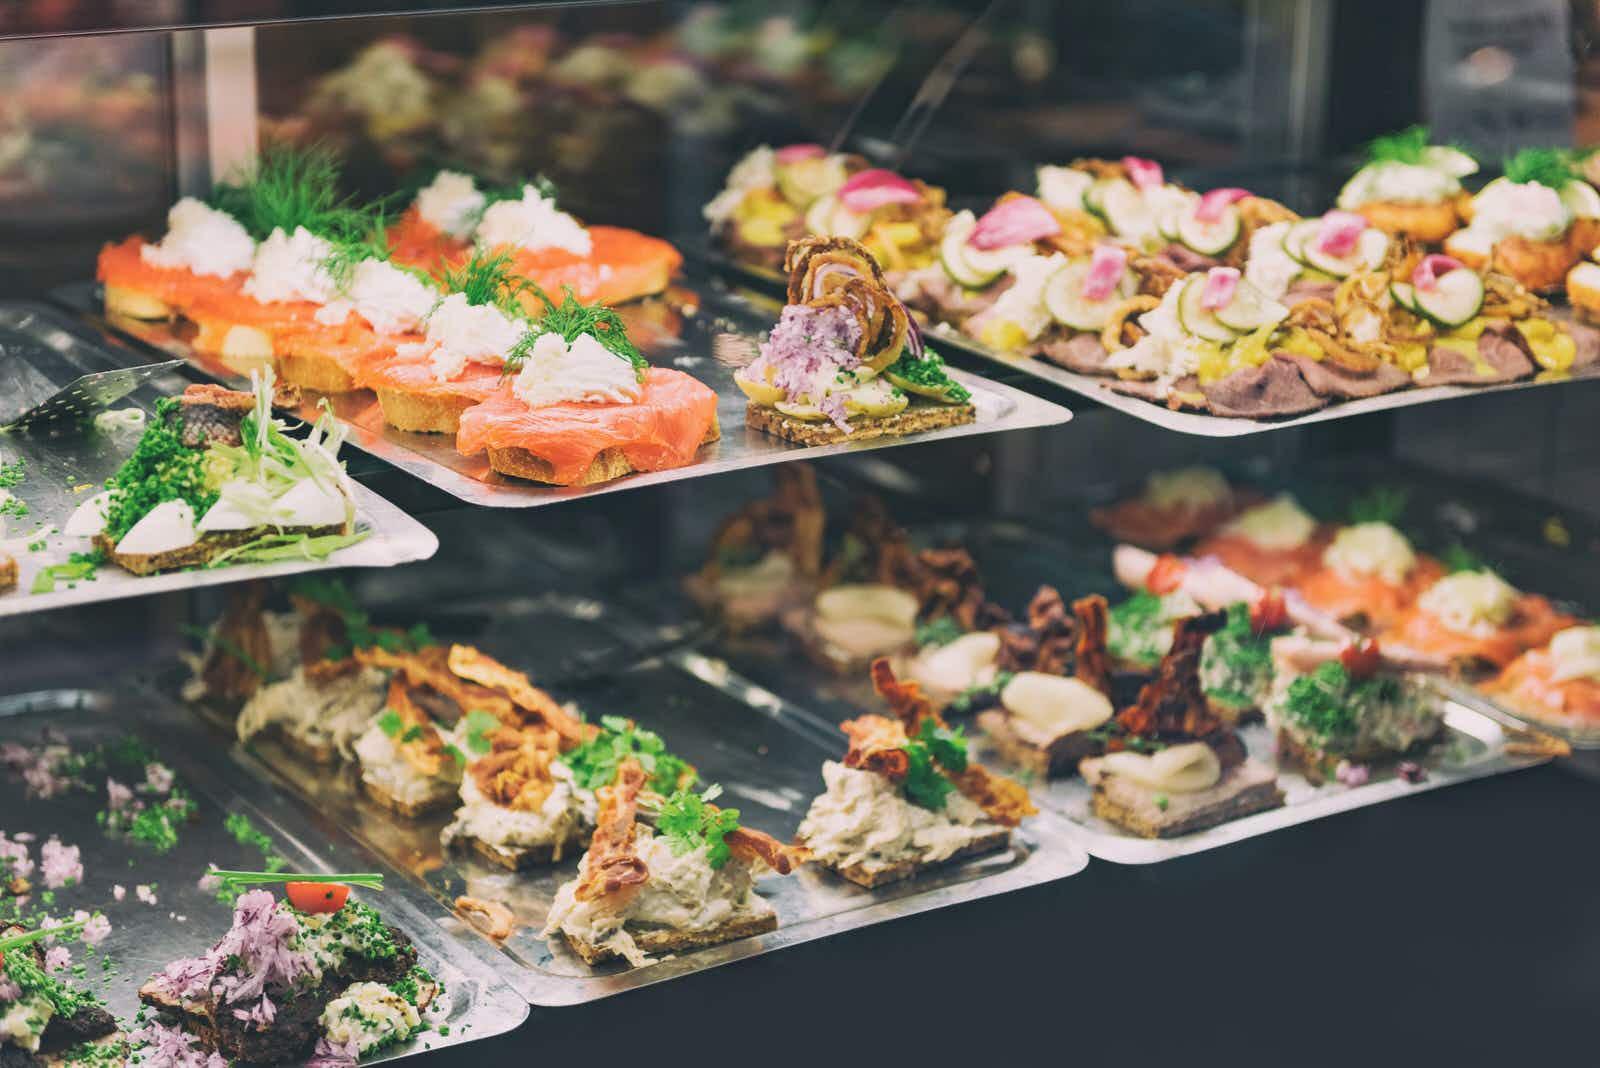 A selection of Danish smørrebrød, traditional open-faced sandwiches,  at Torvehallerne © Maridav / Shutterstock